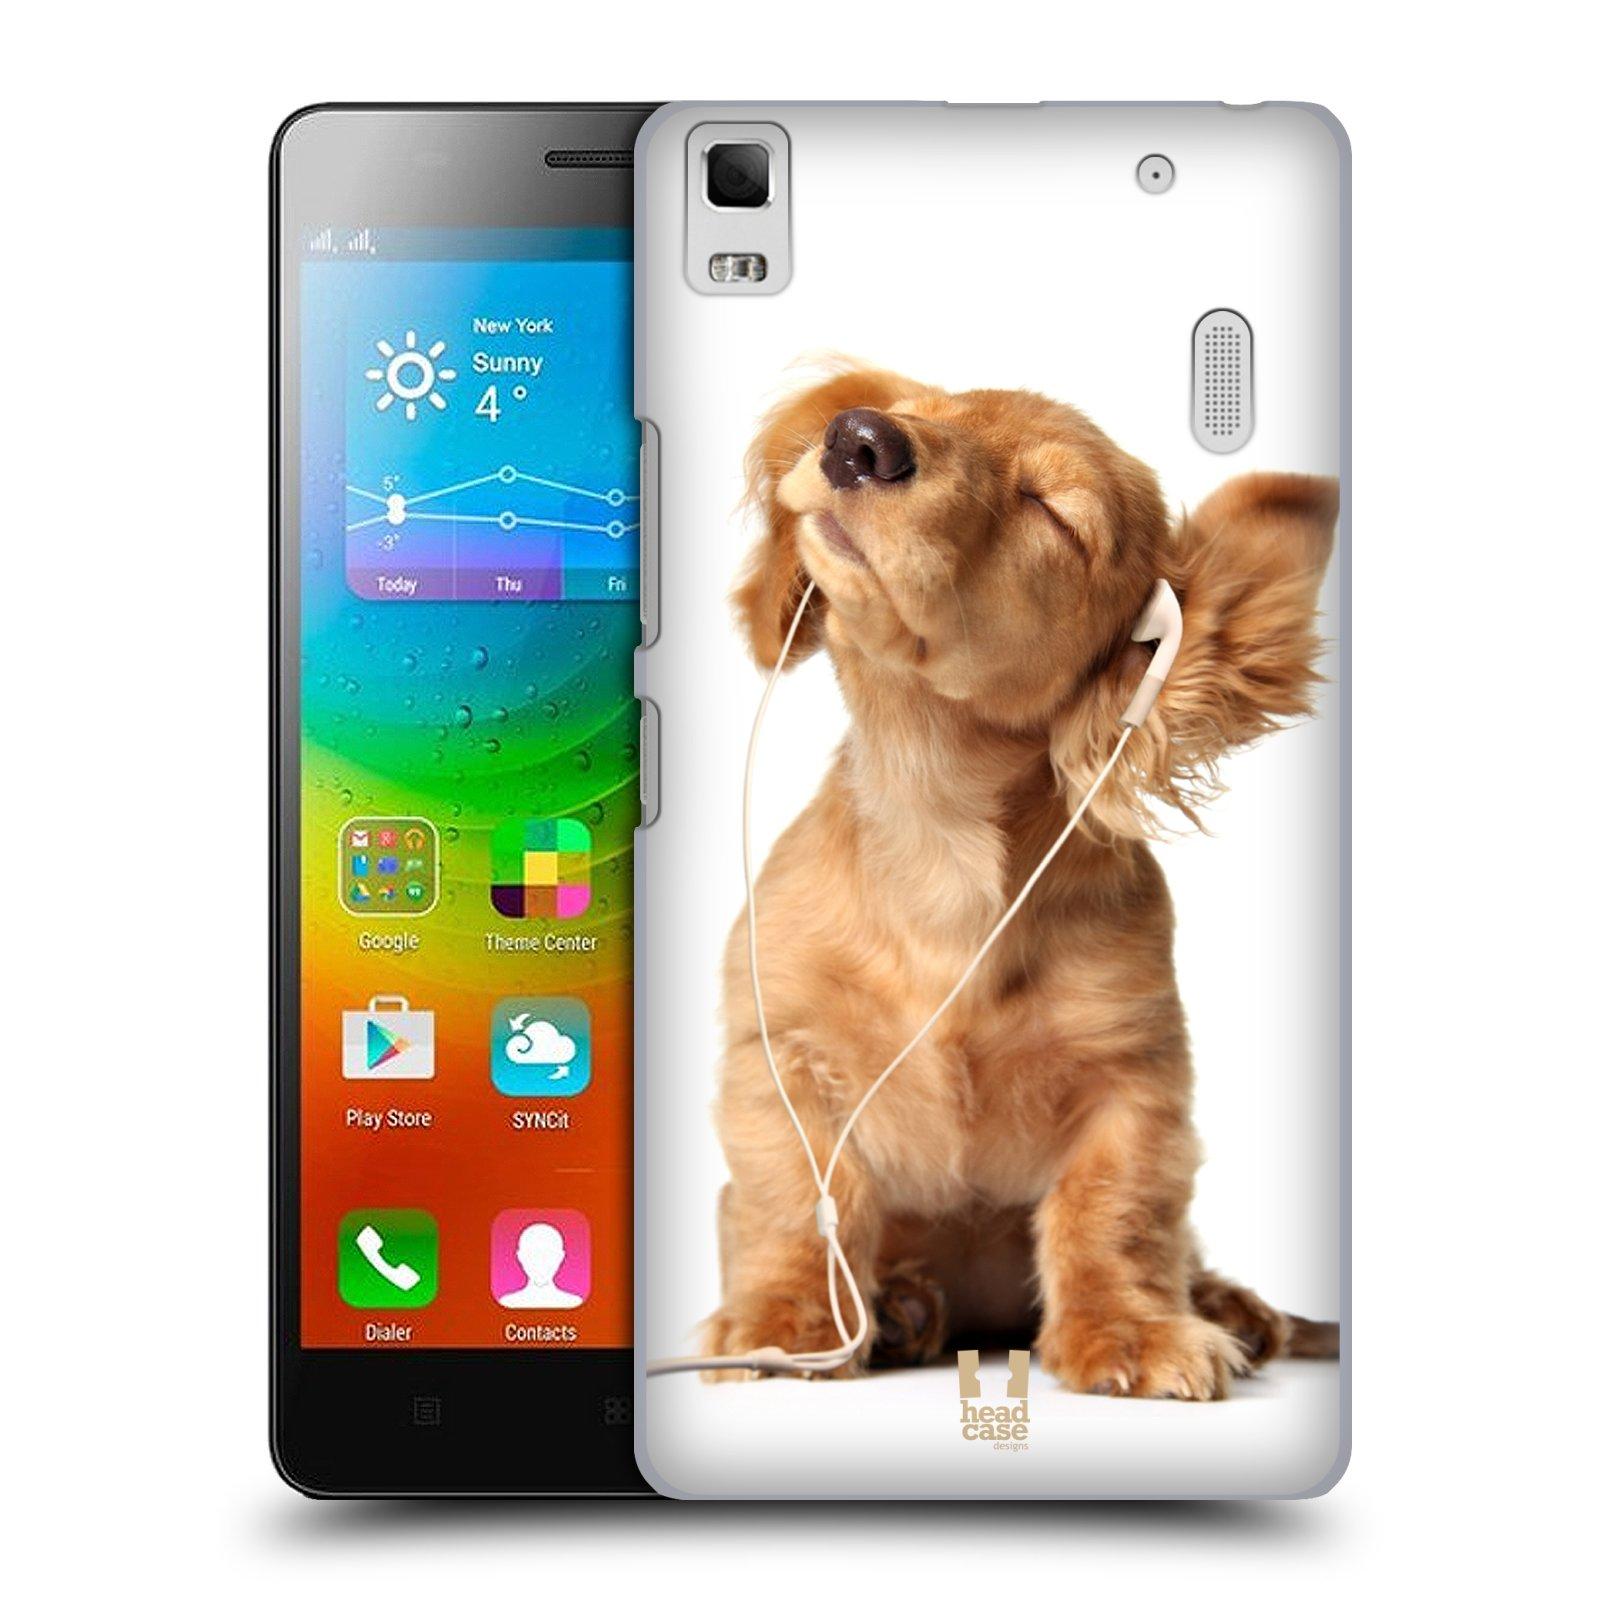 HEAD CASE pevný plastový obal na mobil LENOVO A7000 / A7000 DUAL / K3 NOTE vzor Legrační zvířátka roztomilé štěňátko se sluchátky MUSIC